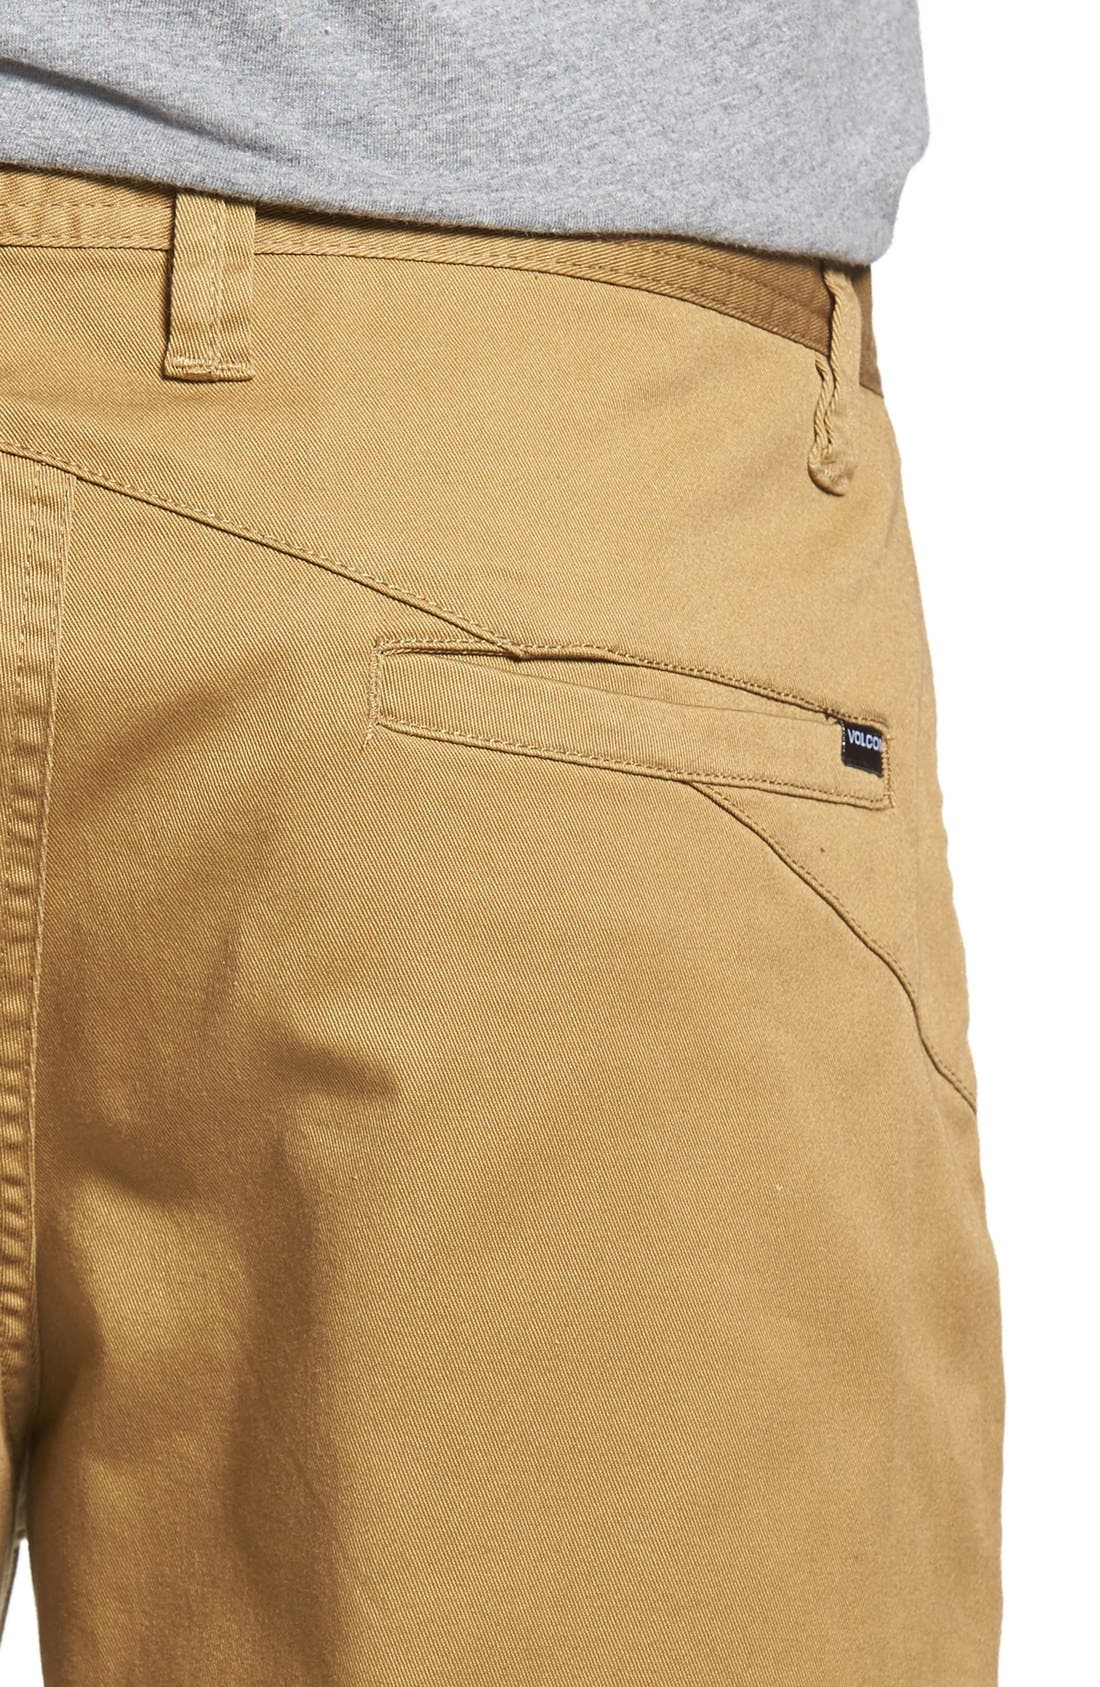 'Modern' Stretch Chino Shorts,                             Alternate thumbnail 41, color,